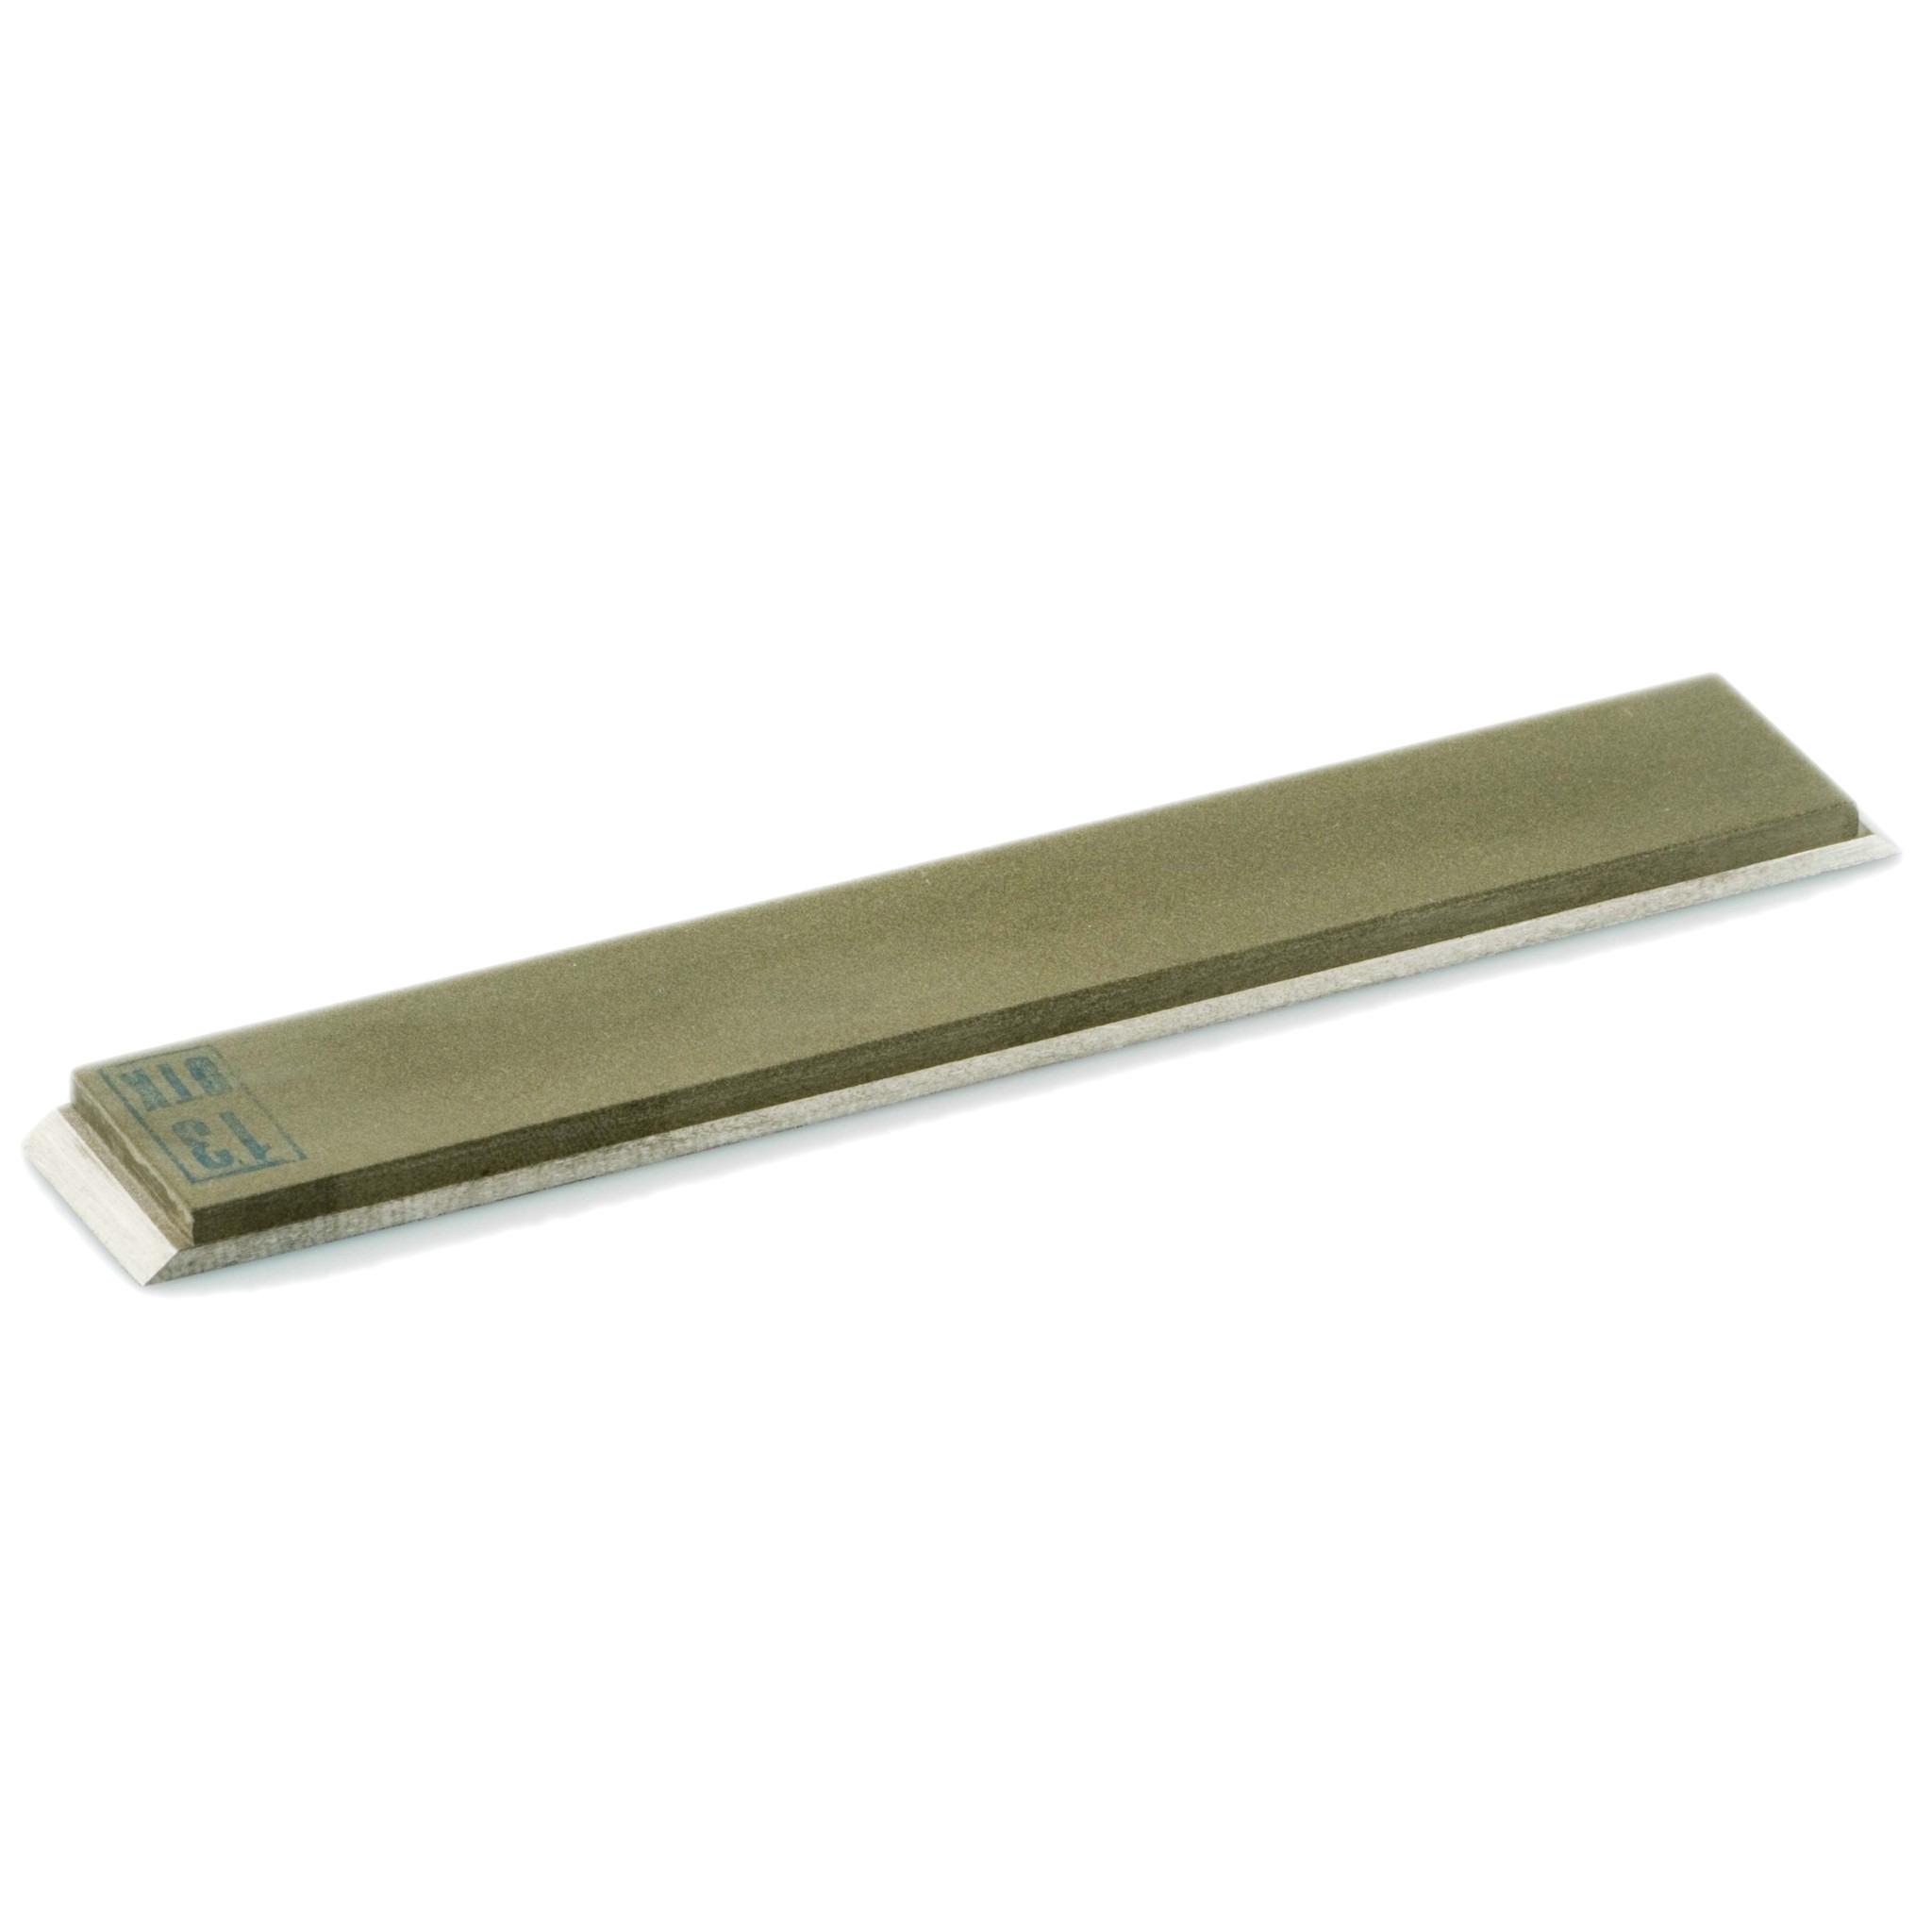 150х25х6 мм для Apex Edge Pro, ЖУК Алмазный брусок 150х25х6 3/2 25% Белый.jpg